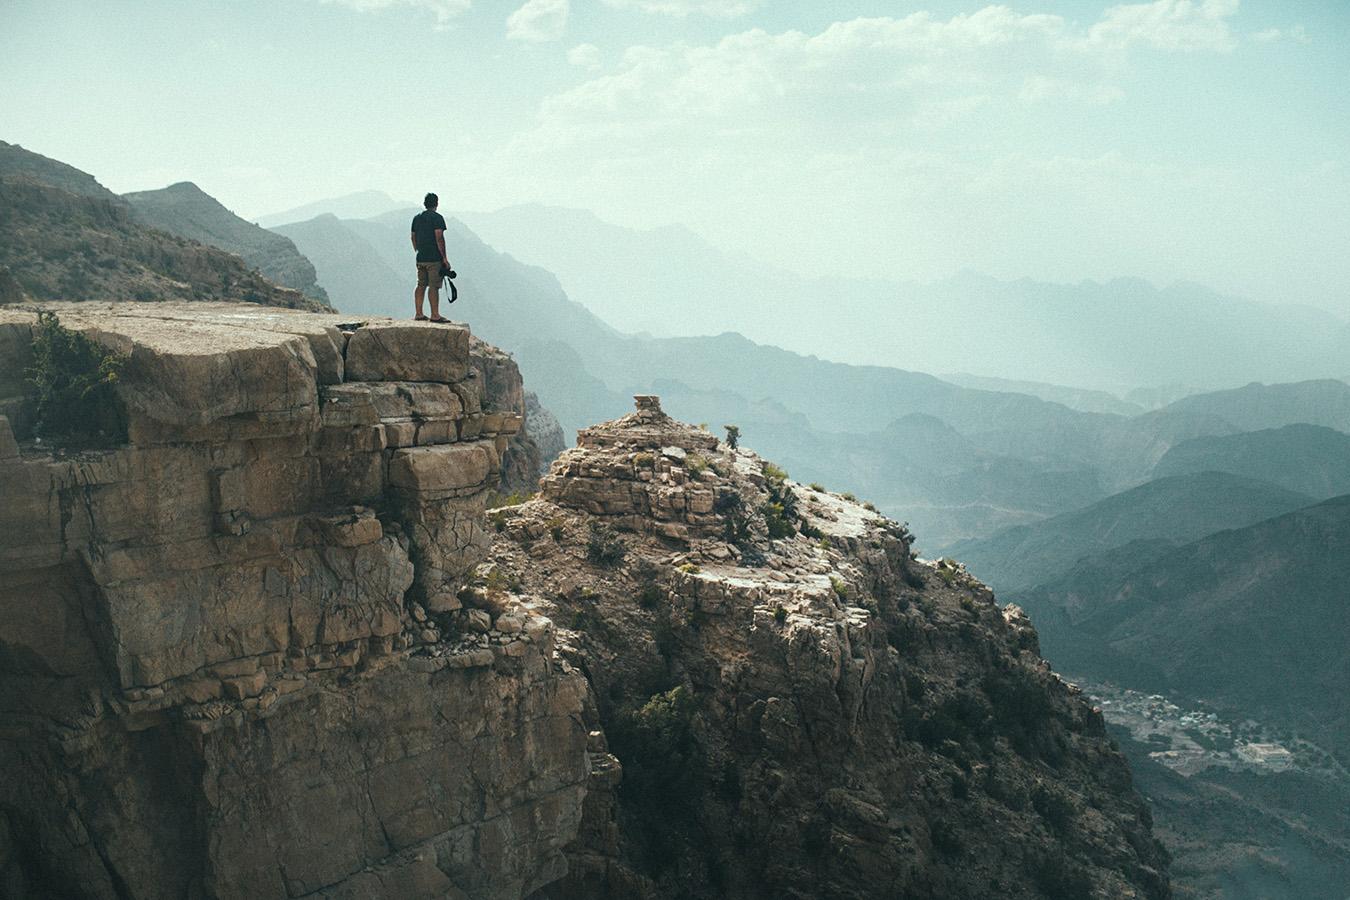 Wadi Bani Awf, Oman